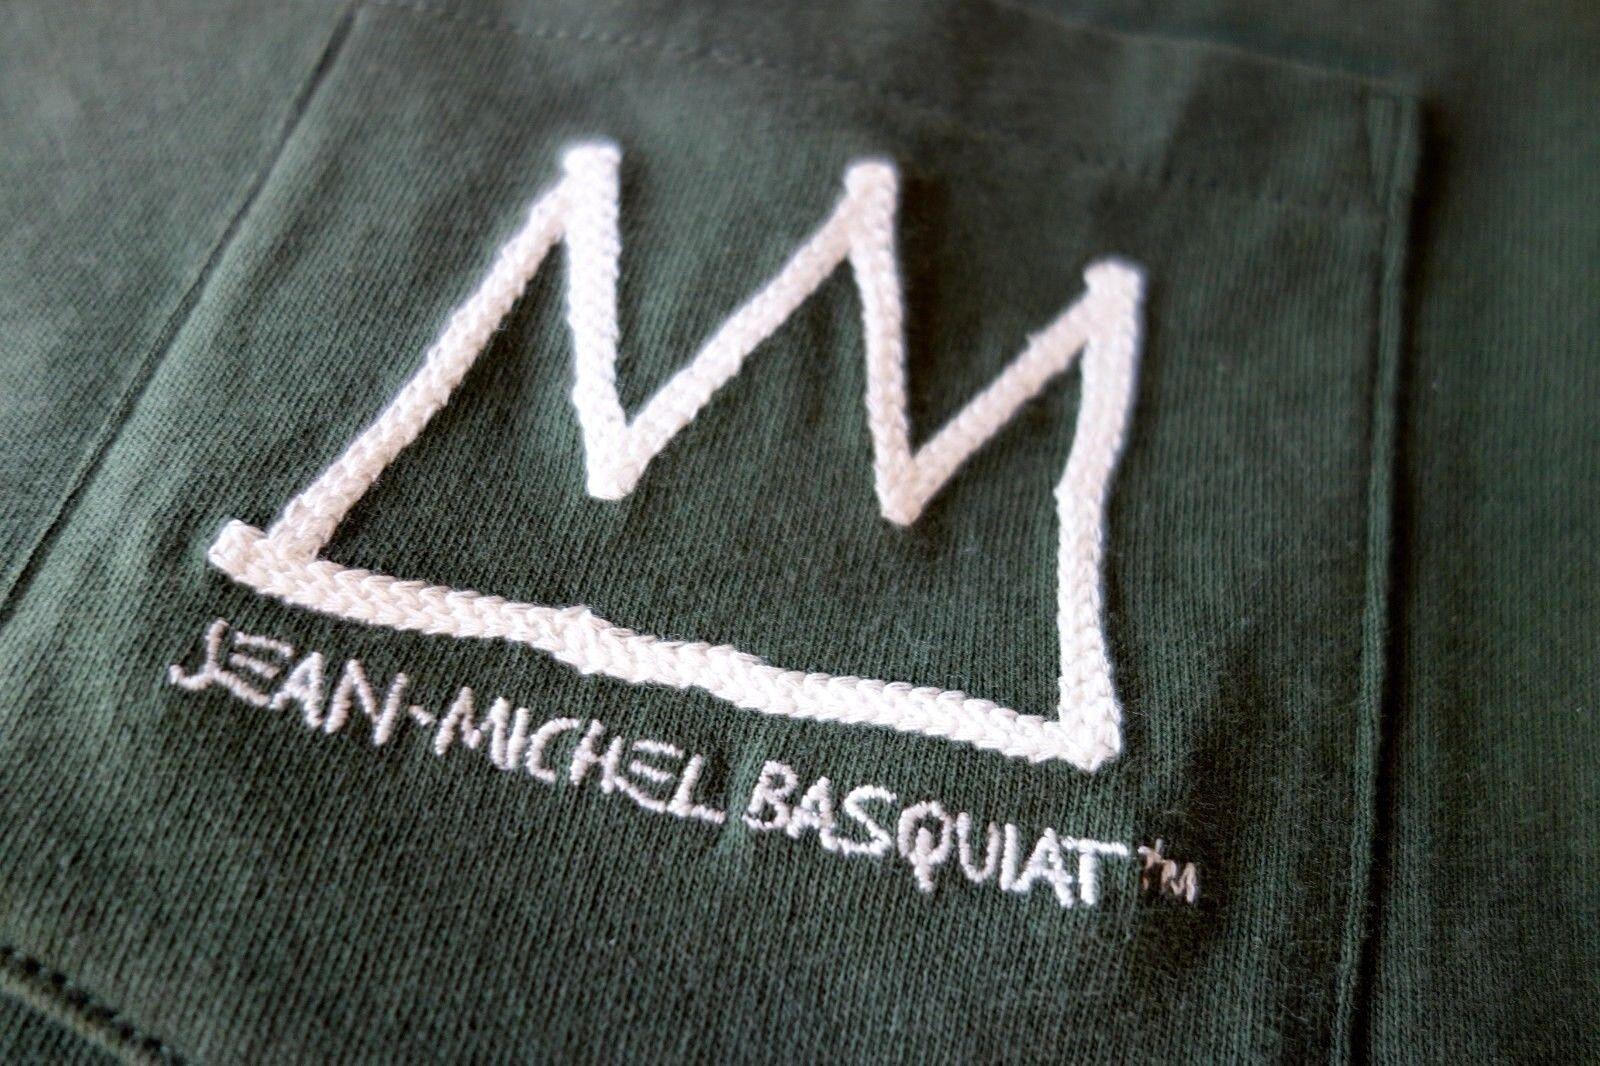 JEAN-MICHEL BASQUIAT x UNIQLO Men's T Shirts SPRZ NY  Free Shipping From JAPANT6